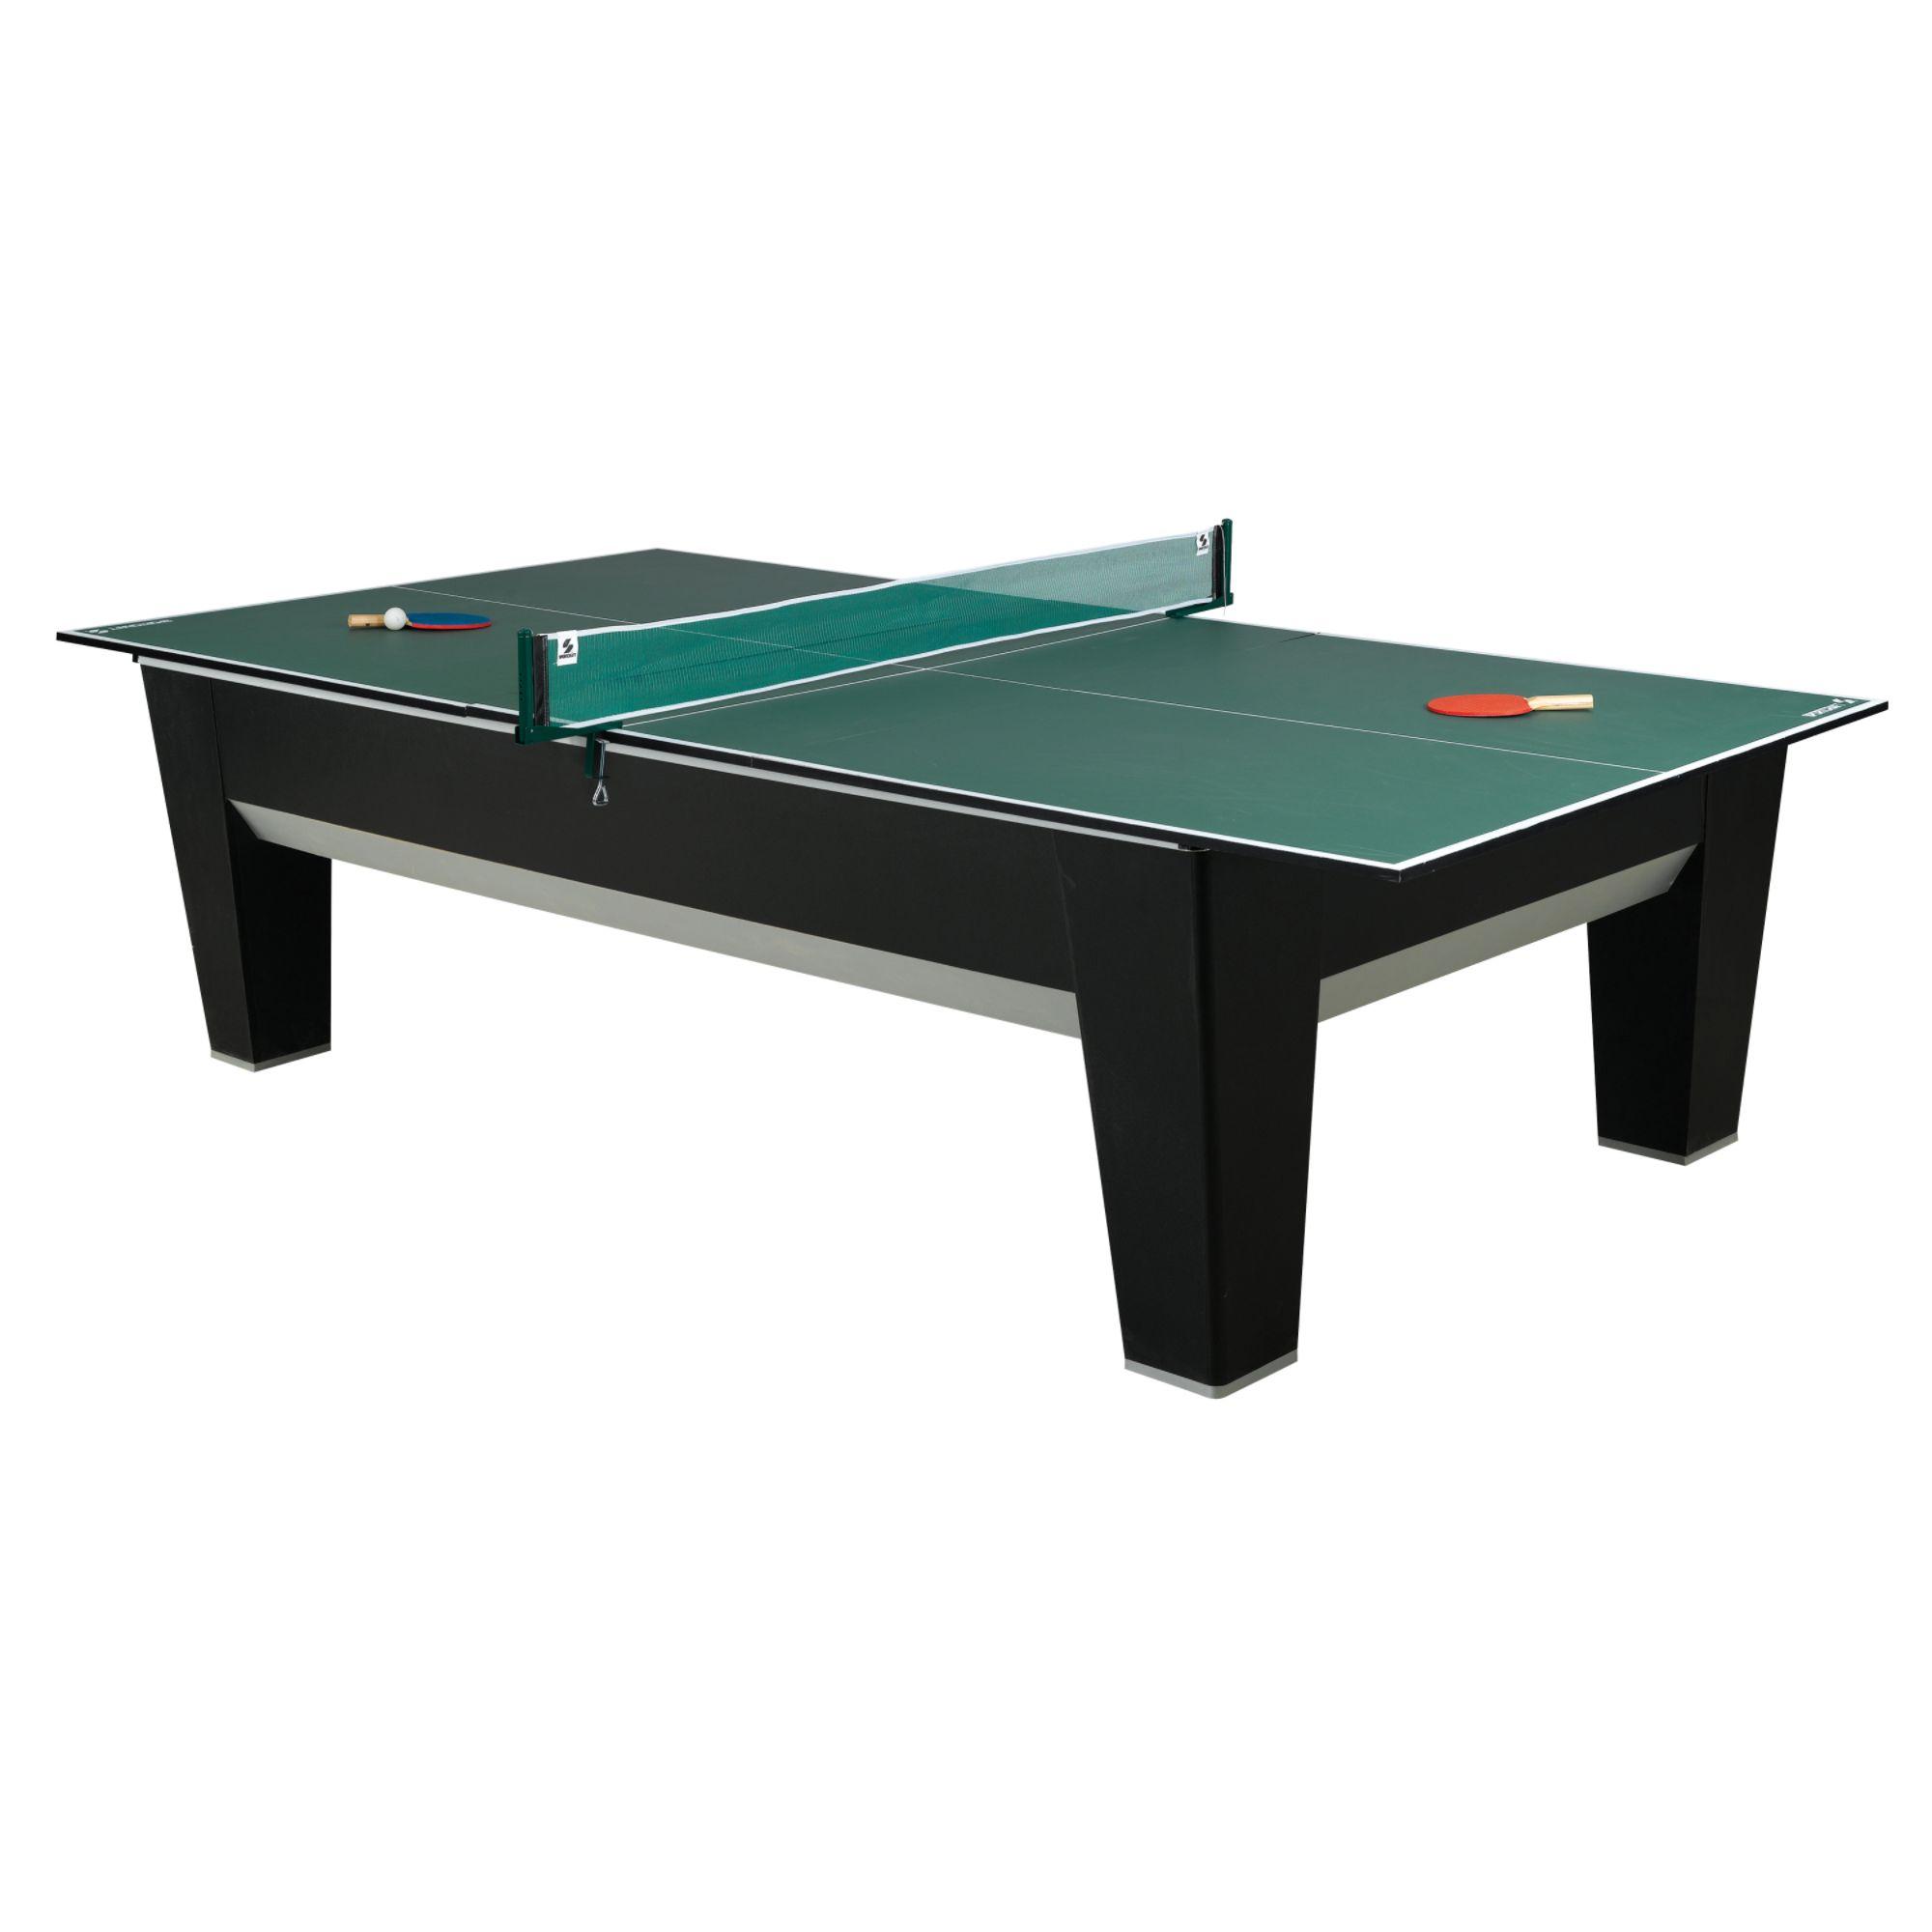 Sportcraft 96in Arcade Allendale Billiard Table